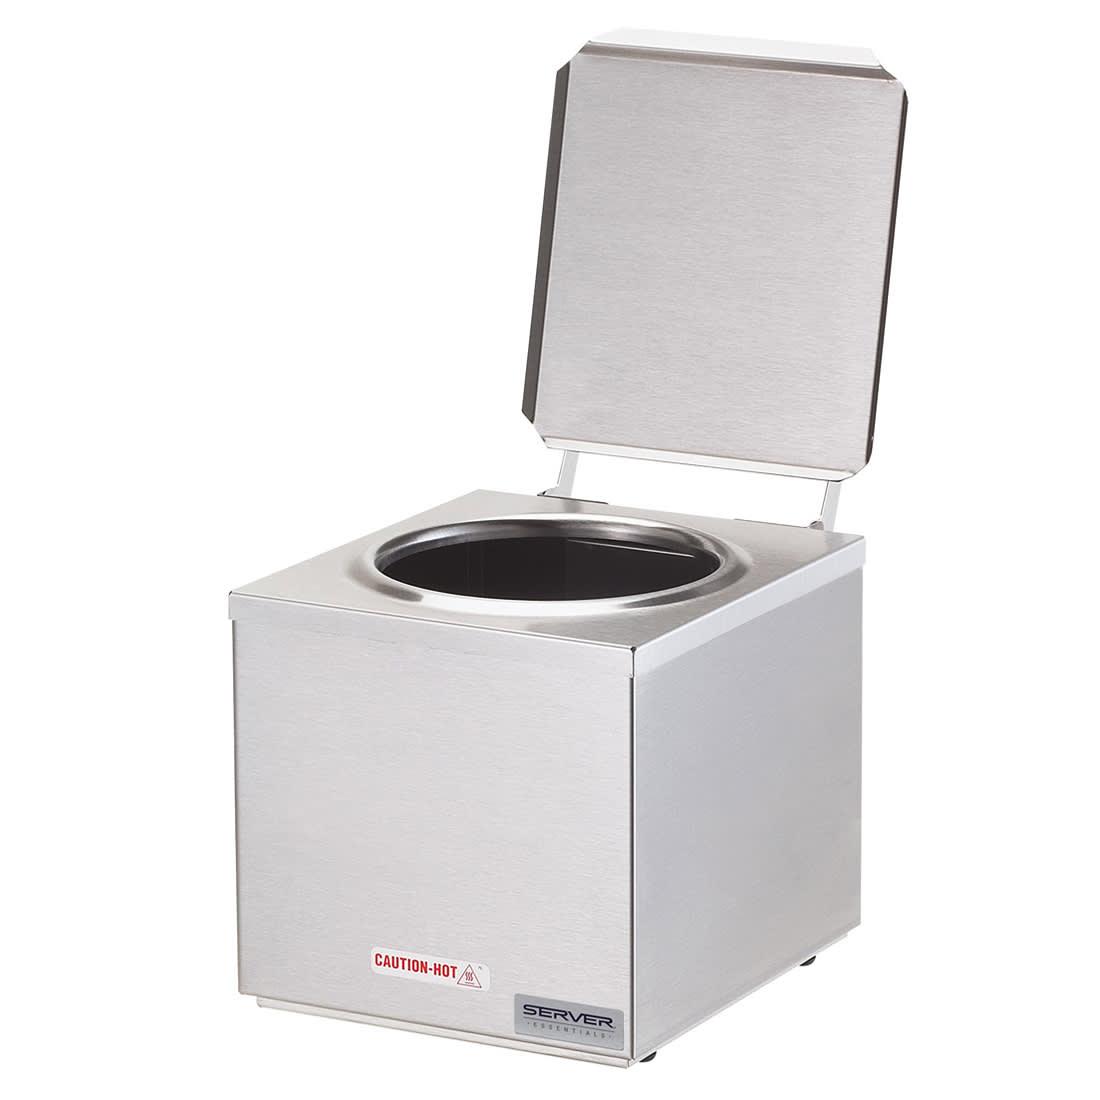 Server 92000 Single Dip Server, Cone Dip Warmer, SS, Countertop, 120 V